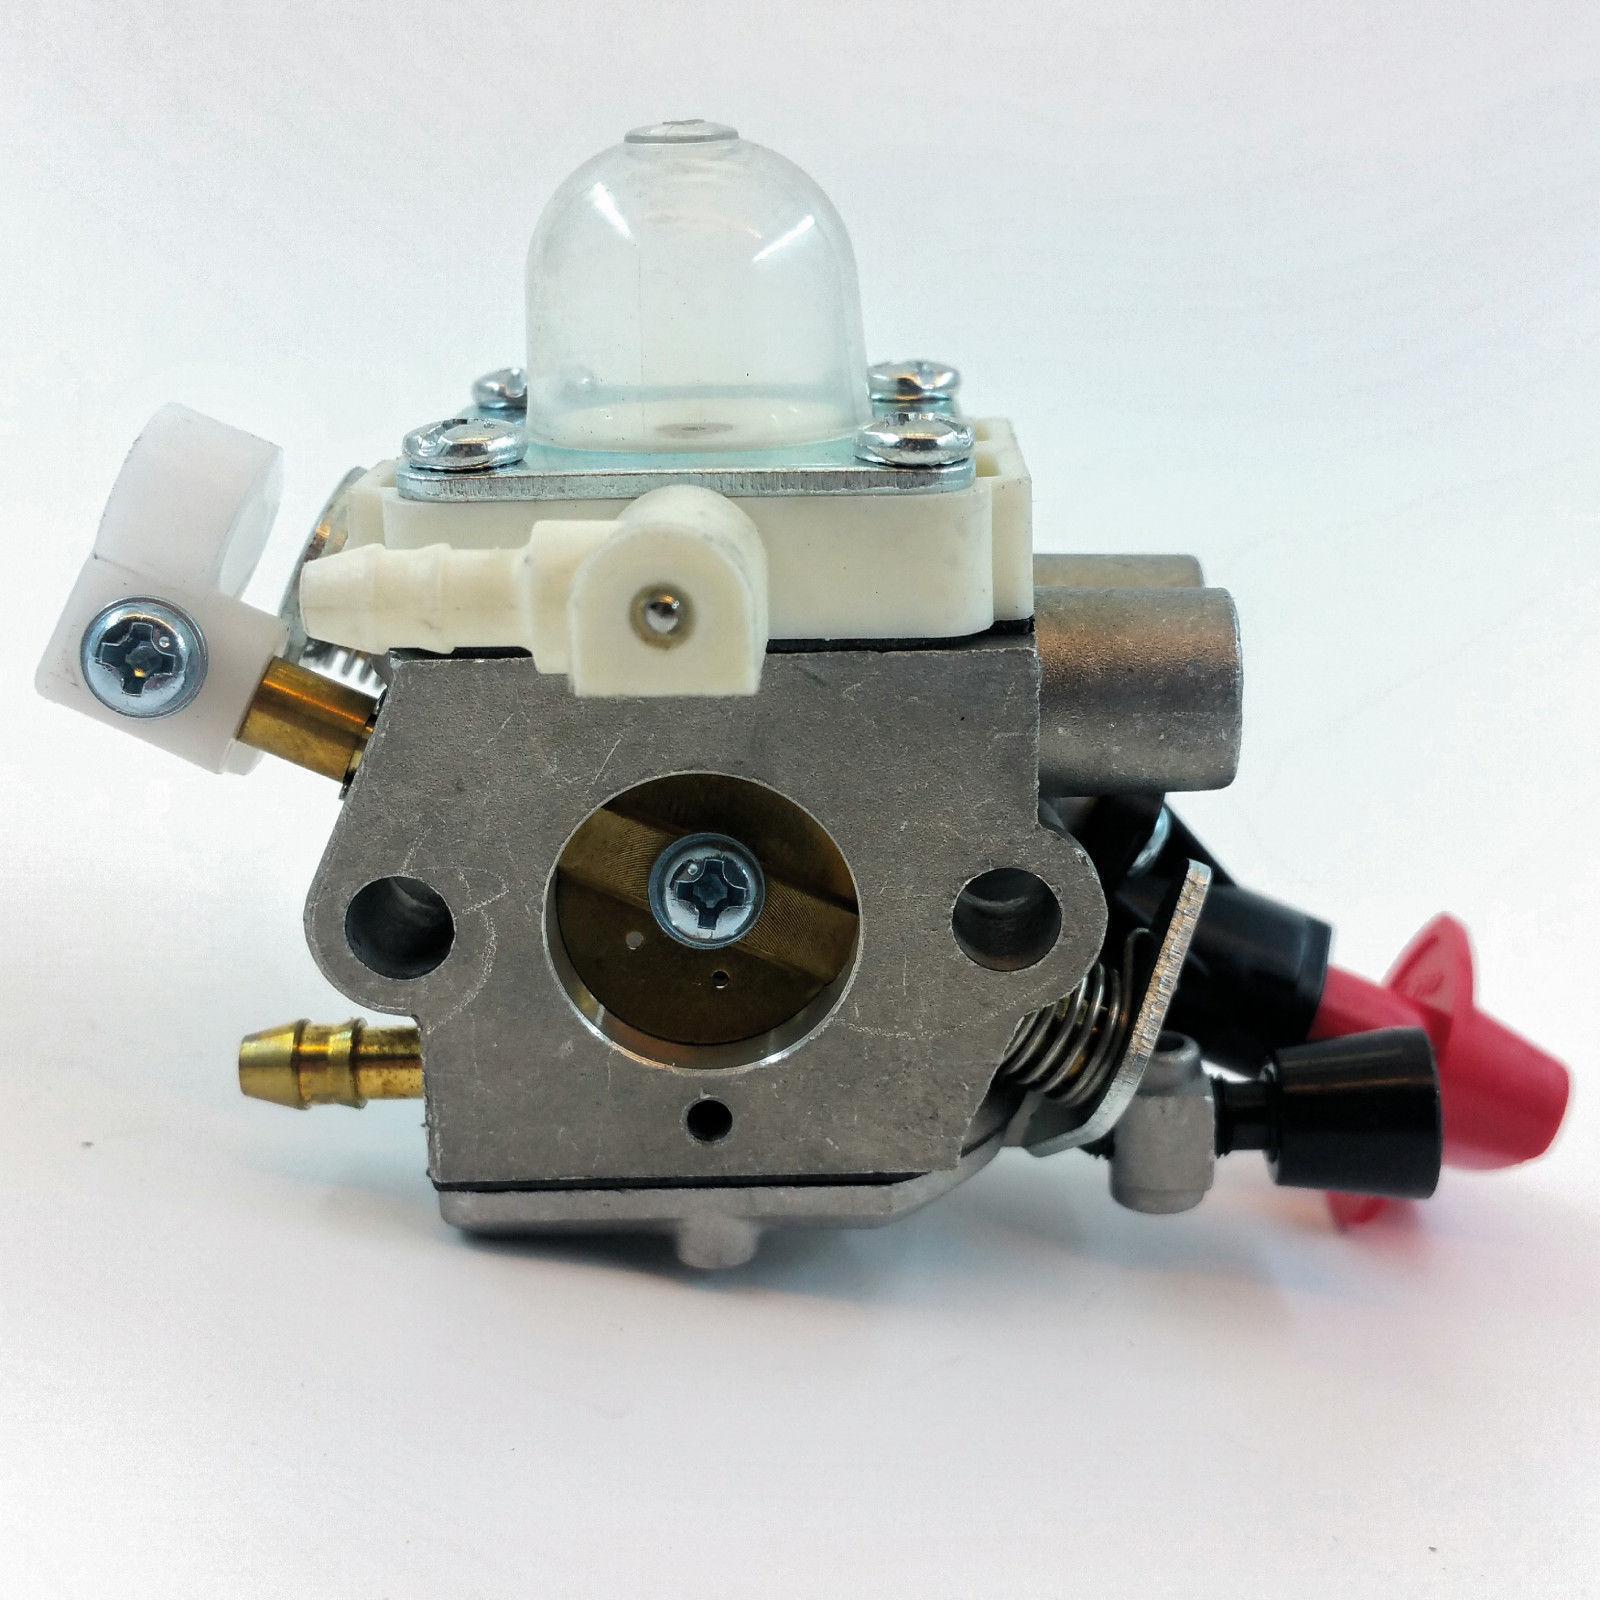 Carburetor For STIHL FC56, FC70, FS40, FS50, FS56, FS70, HL56, HT56, KM56